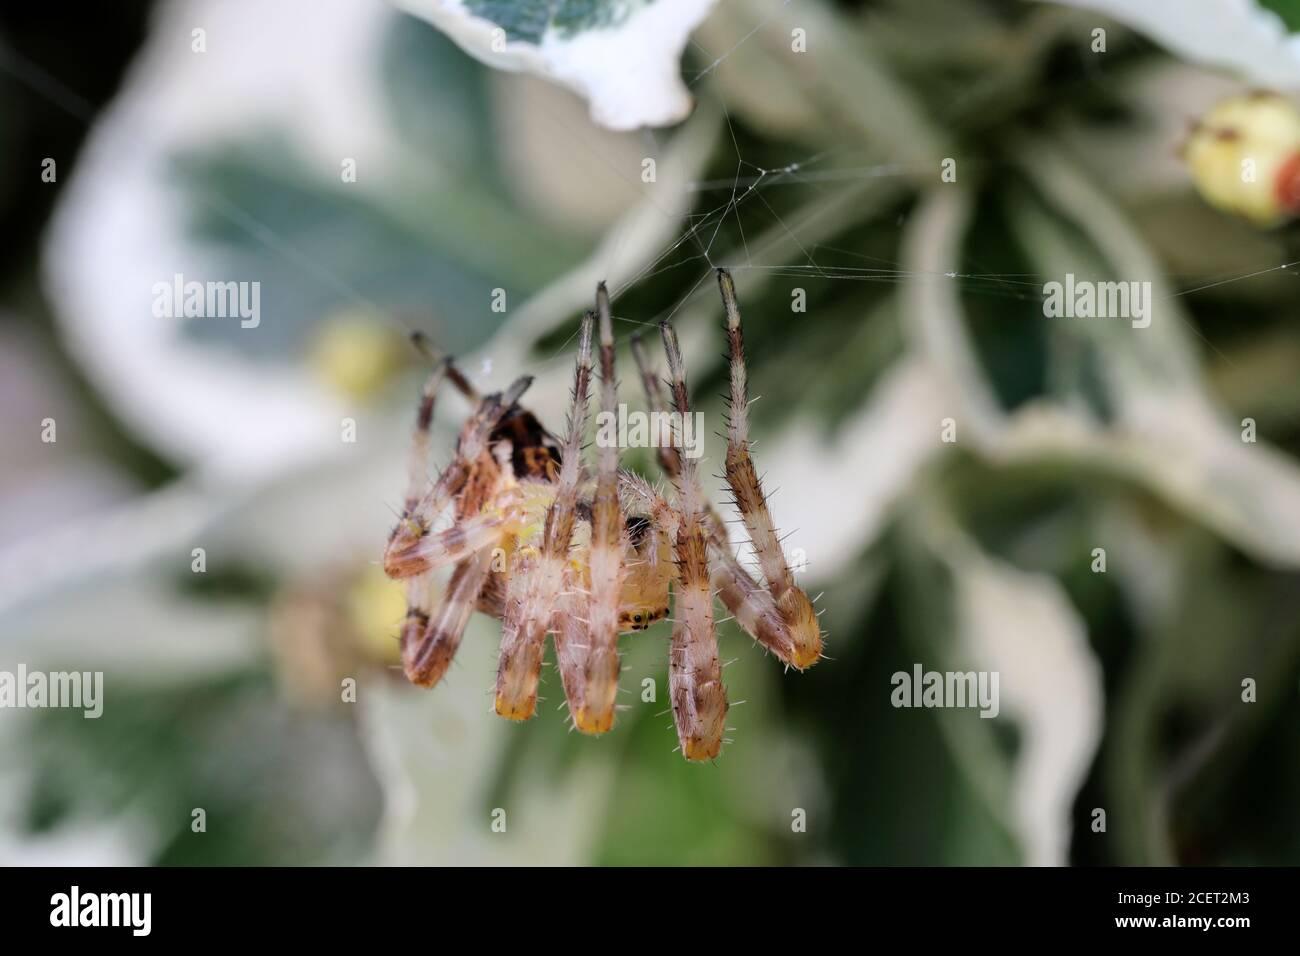 Common Garden Spider Araneus diadematus weaving its Web, England UK Stock Photo